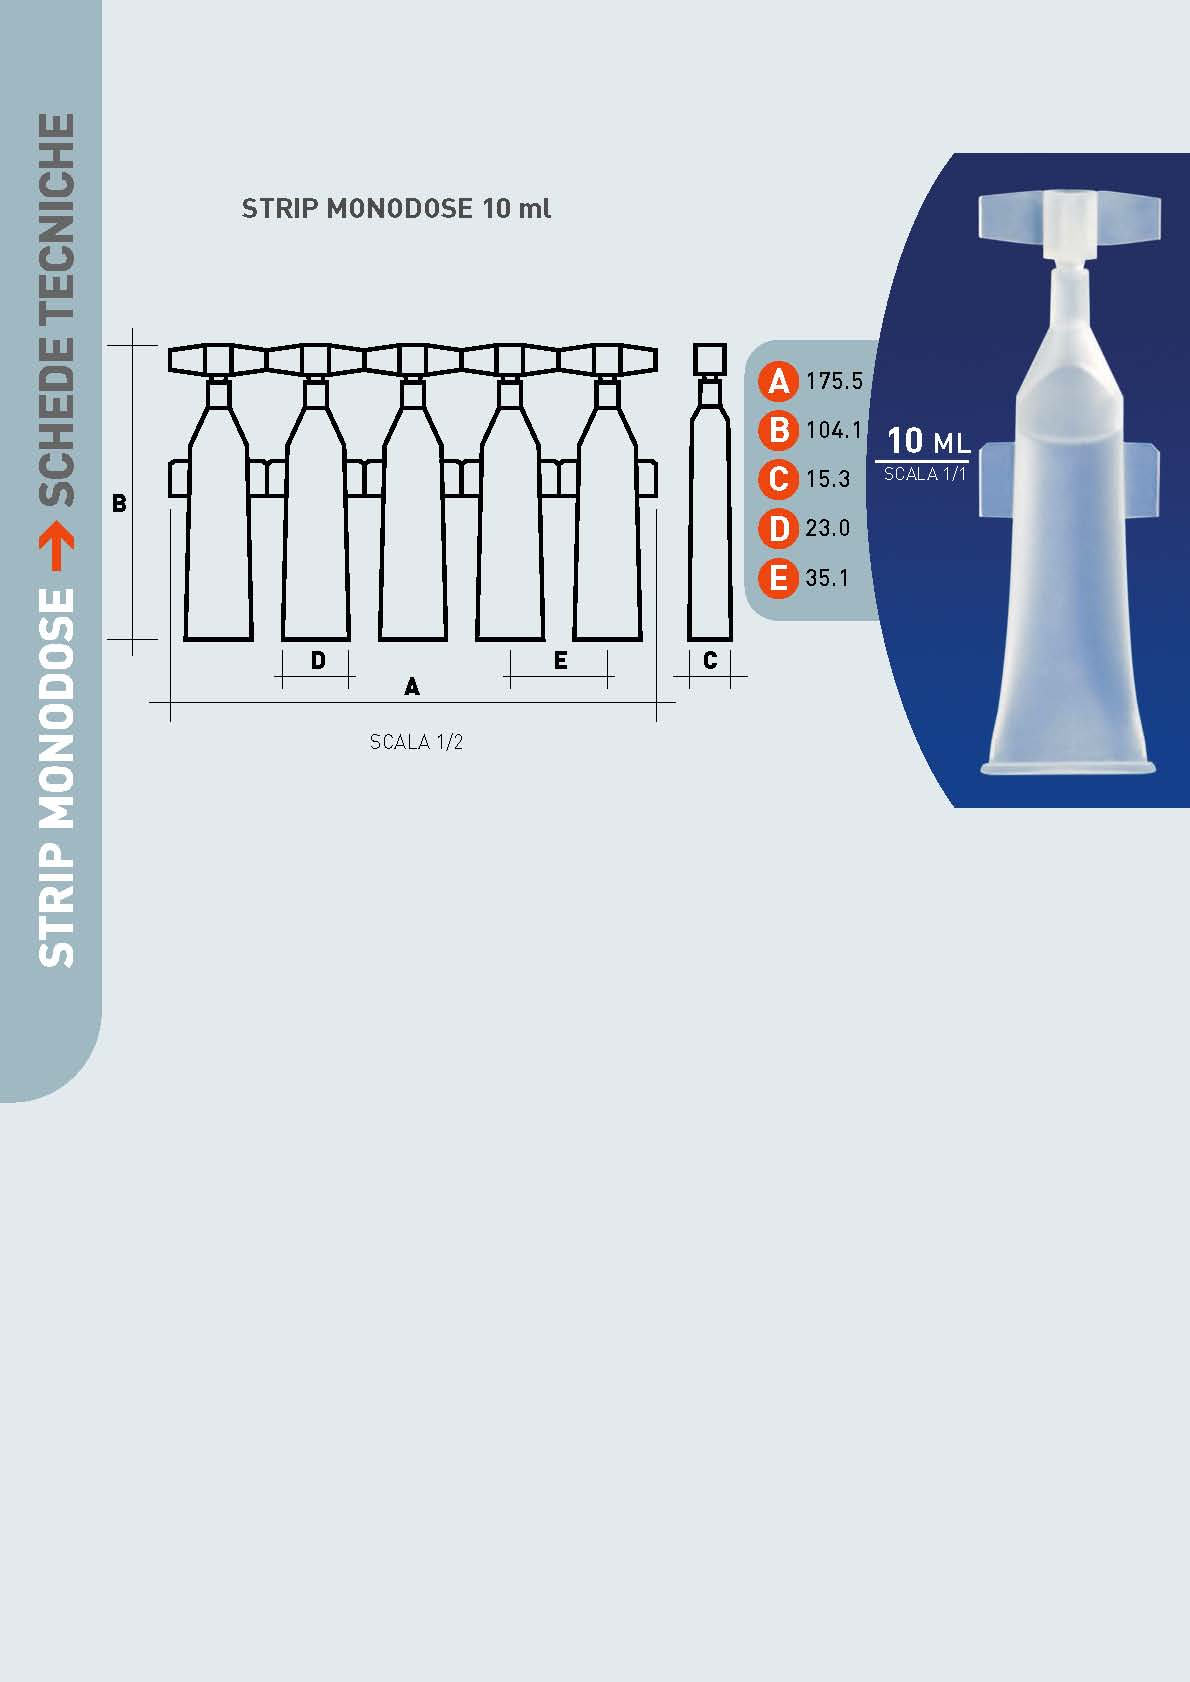 Monodose 10 ML